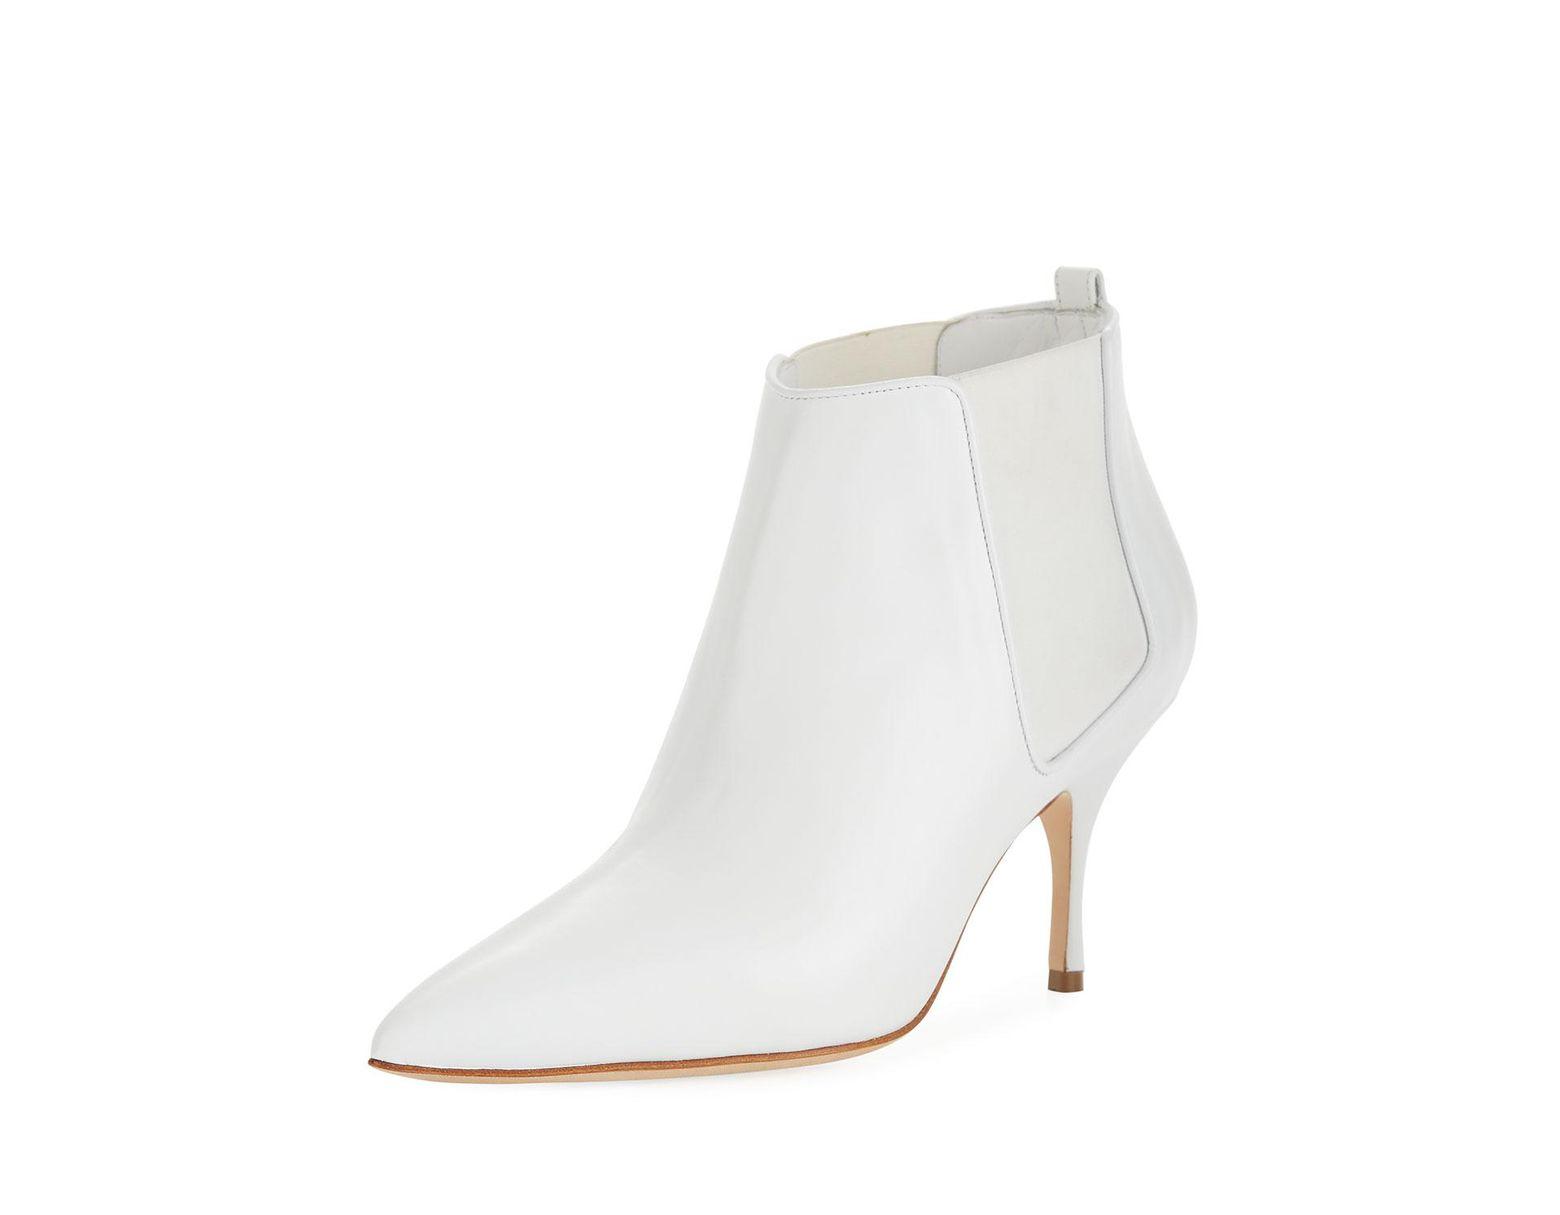 c4695fb5ed546 Manolo Blahnik Dildi Leather Booties in White - Lyst